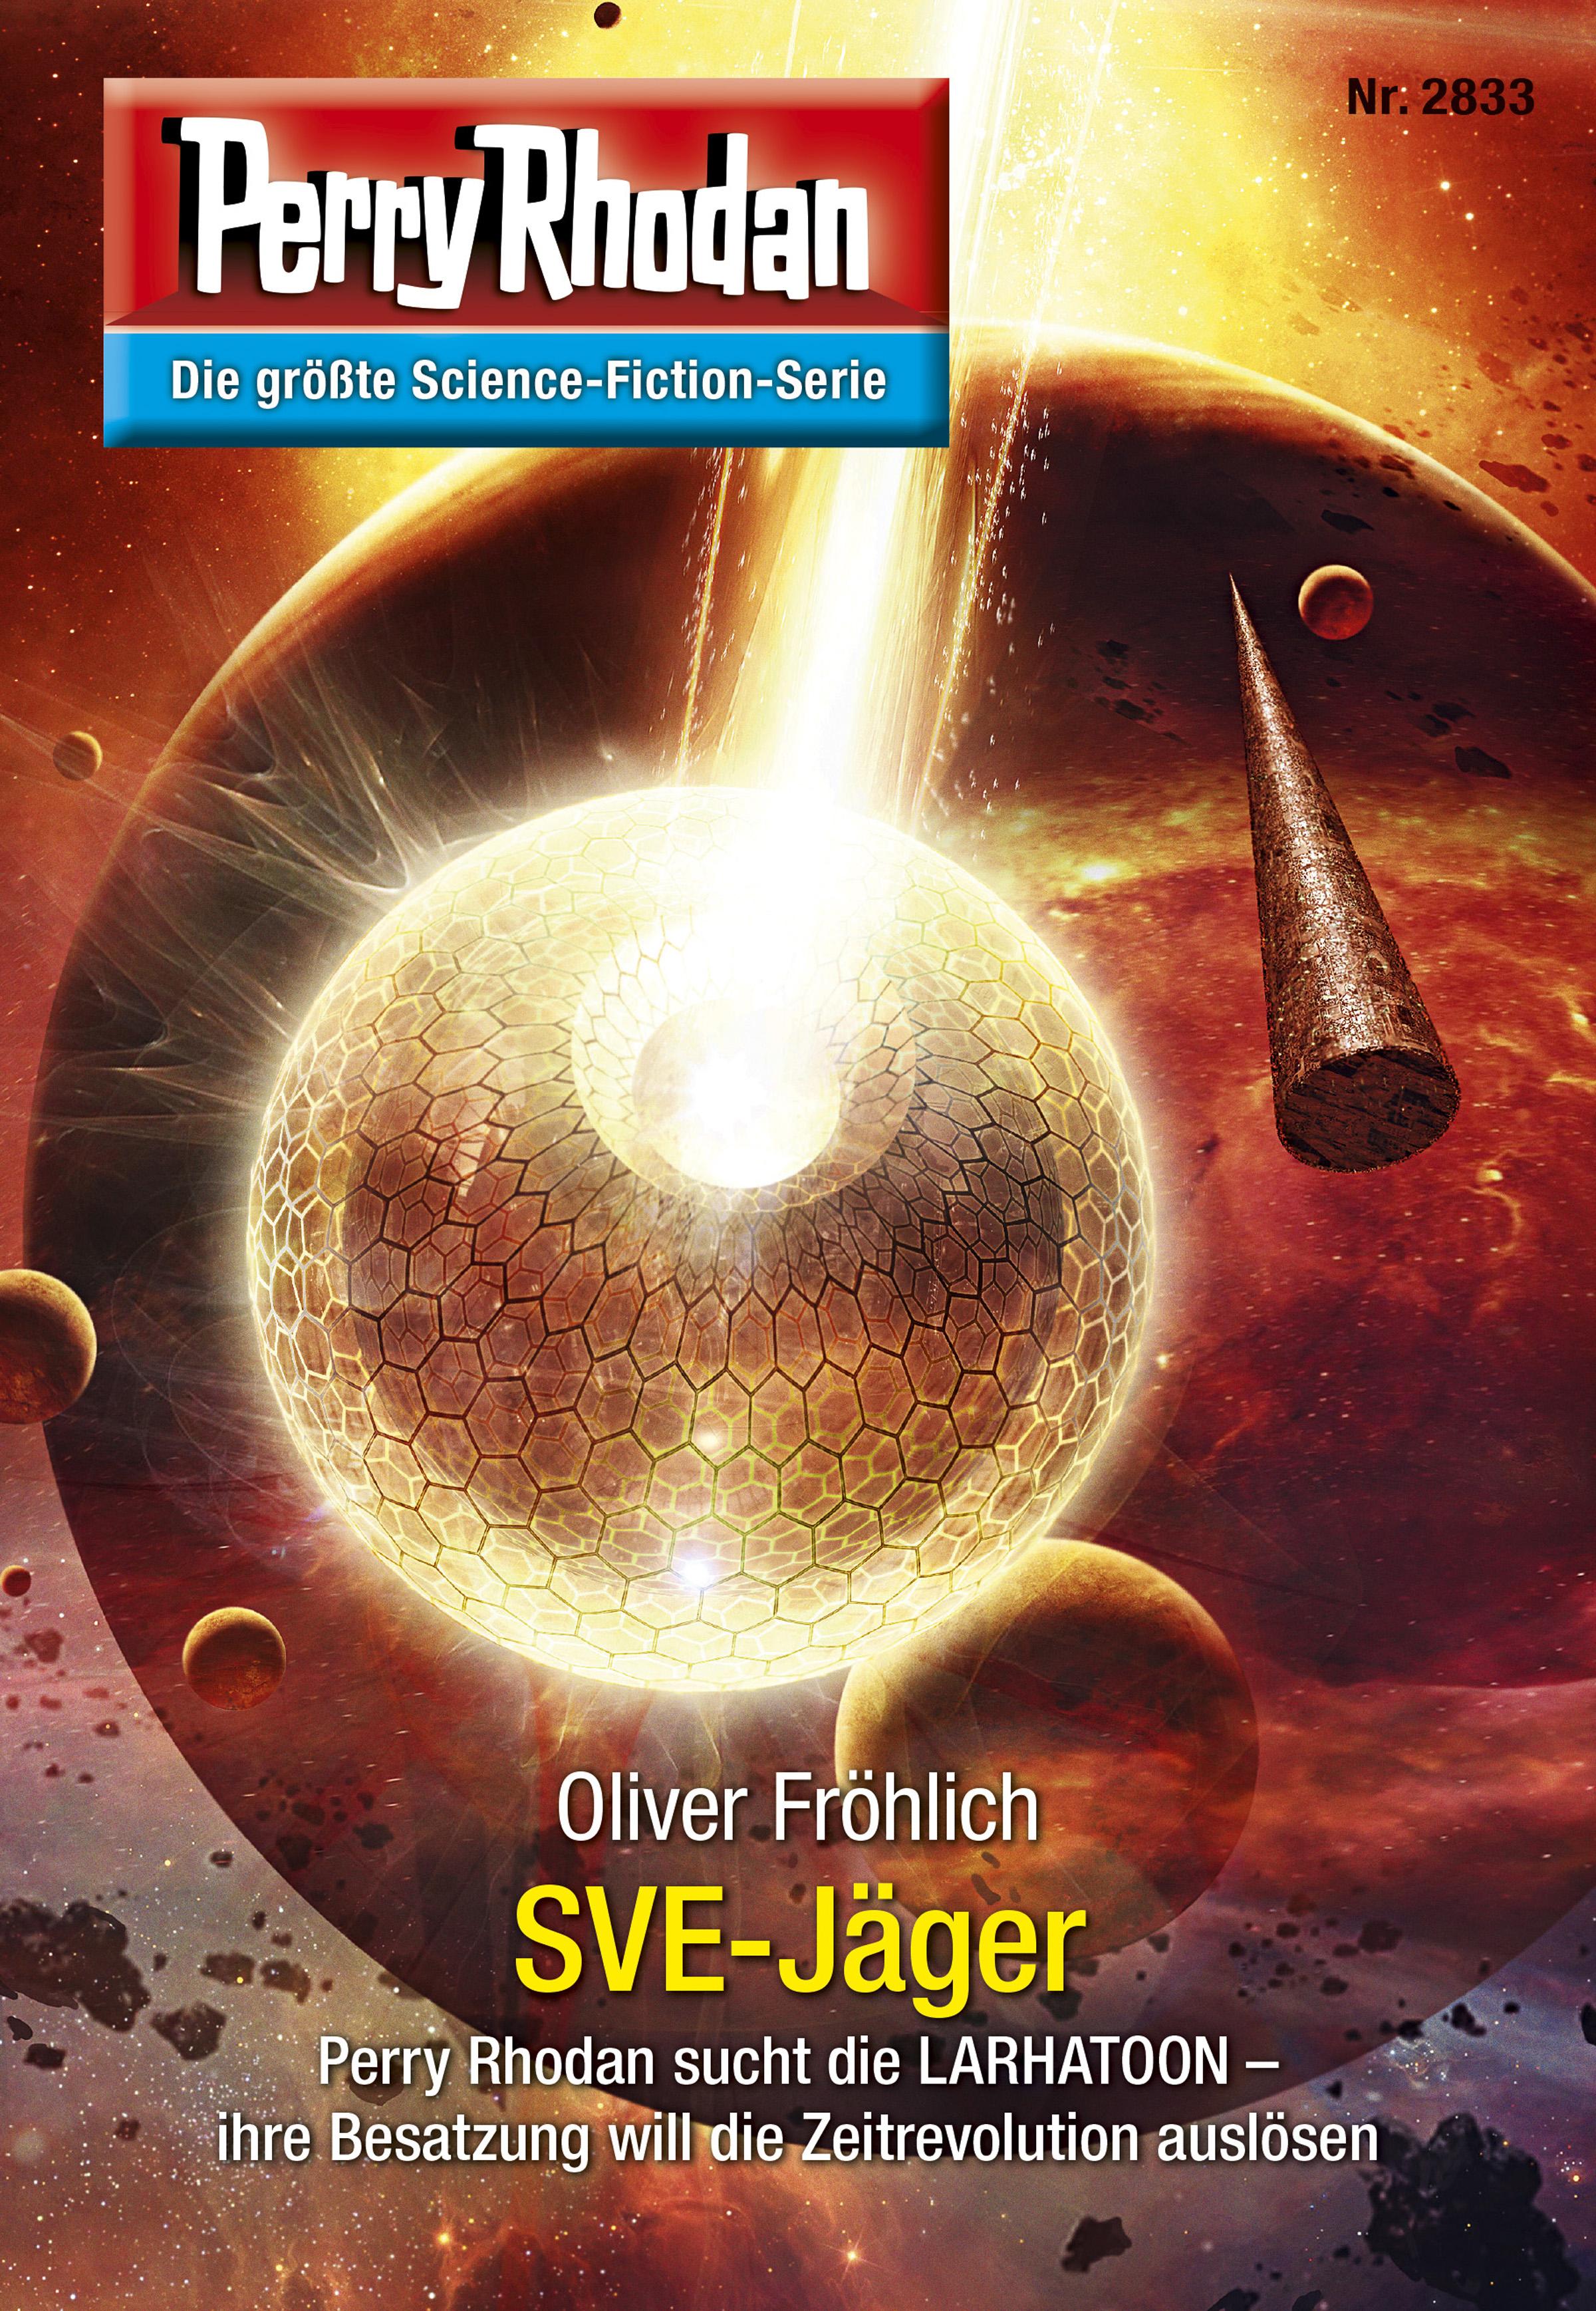 цена на Oliver Frohlich Perry Rhodan 2833: SVE-Jäger